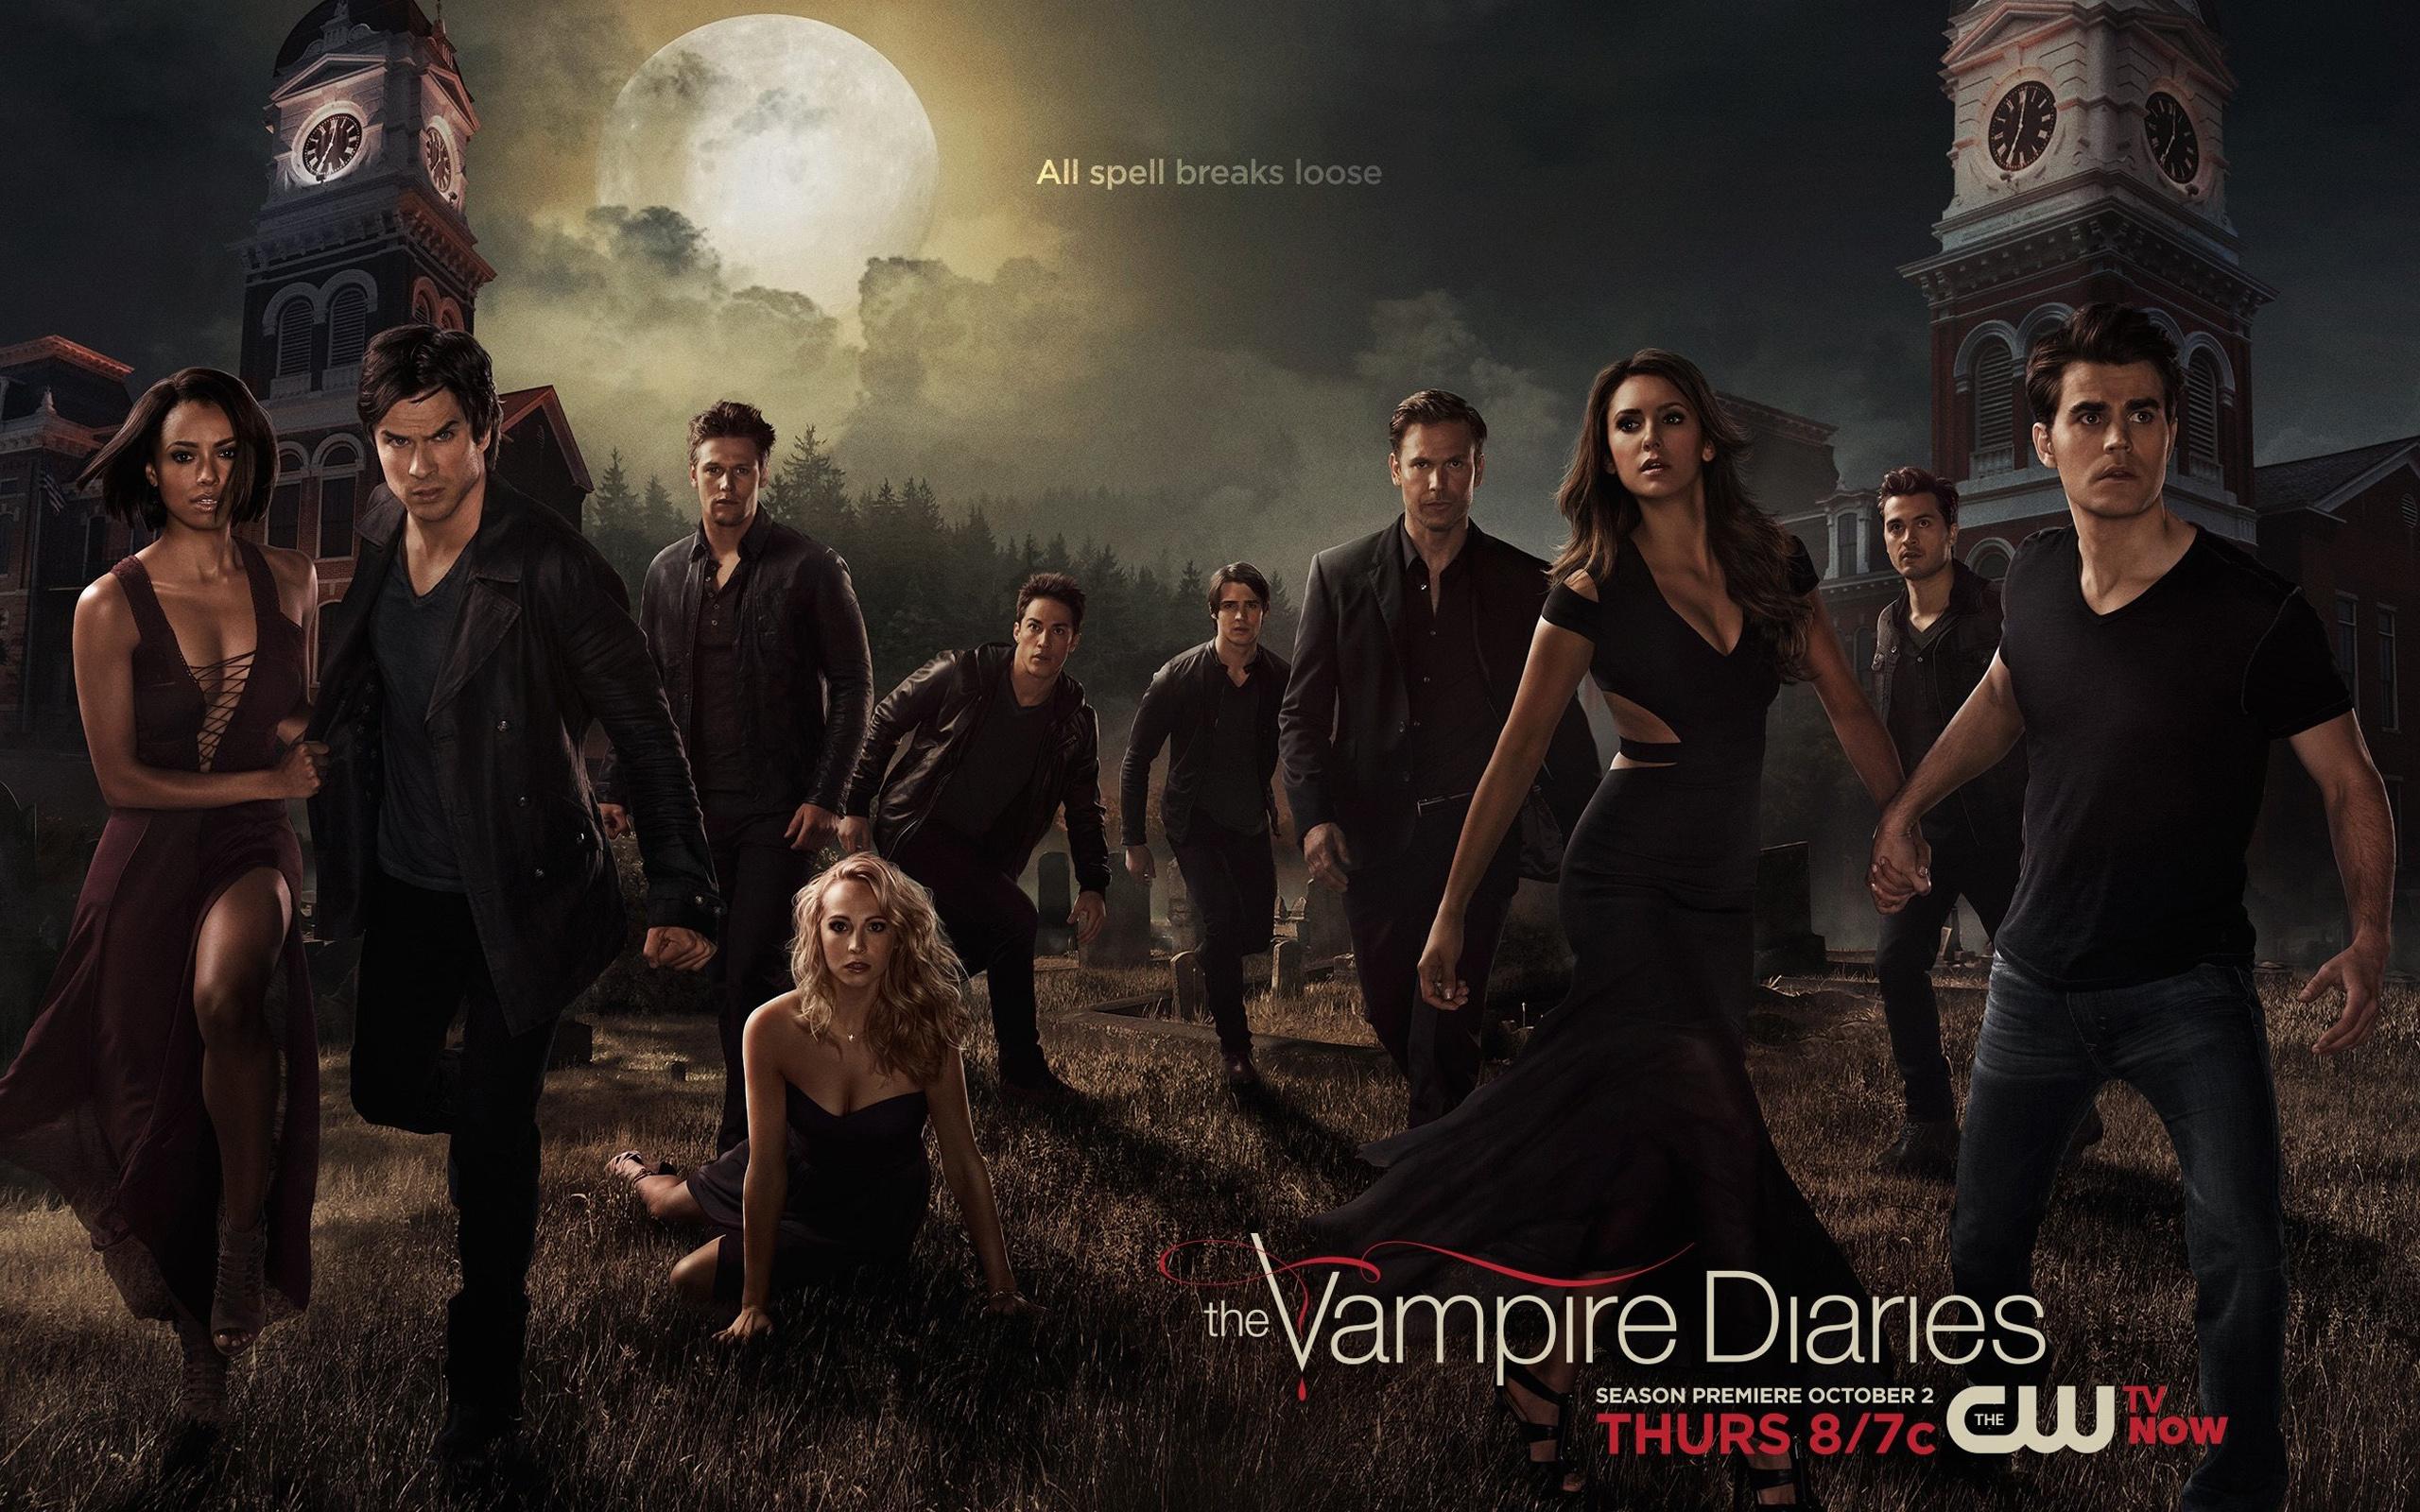 The Vampire Diaries Season 6 HD Wallpaper 7205 2560x1600